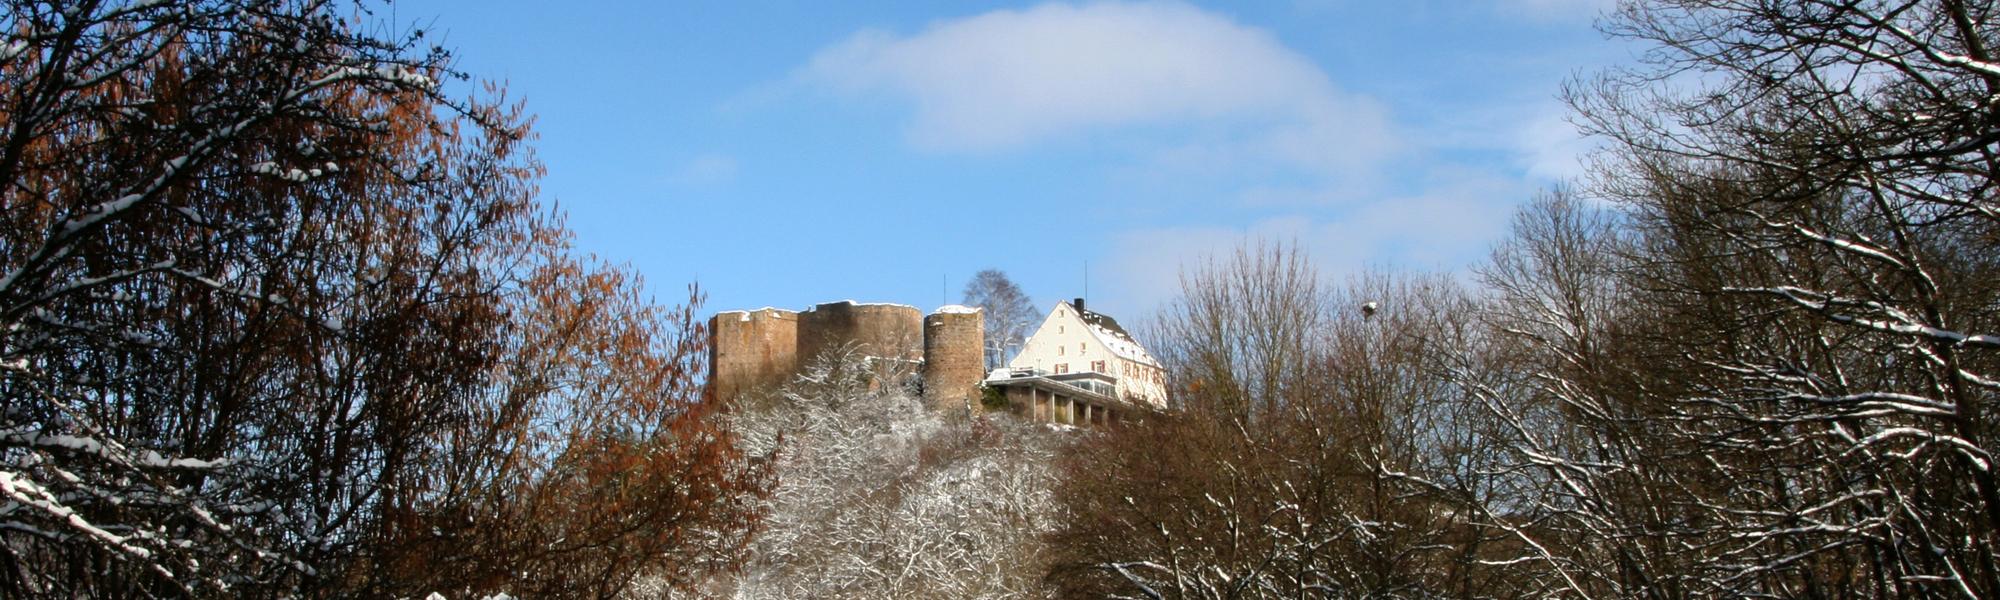 Kyrburg Winter